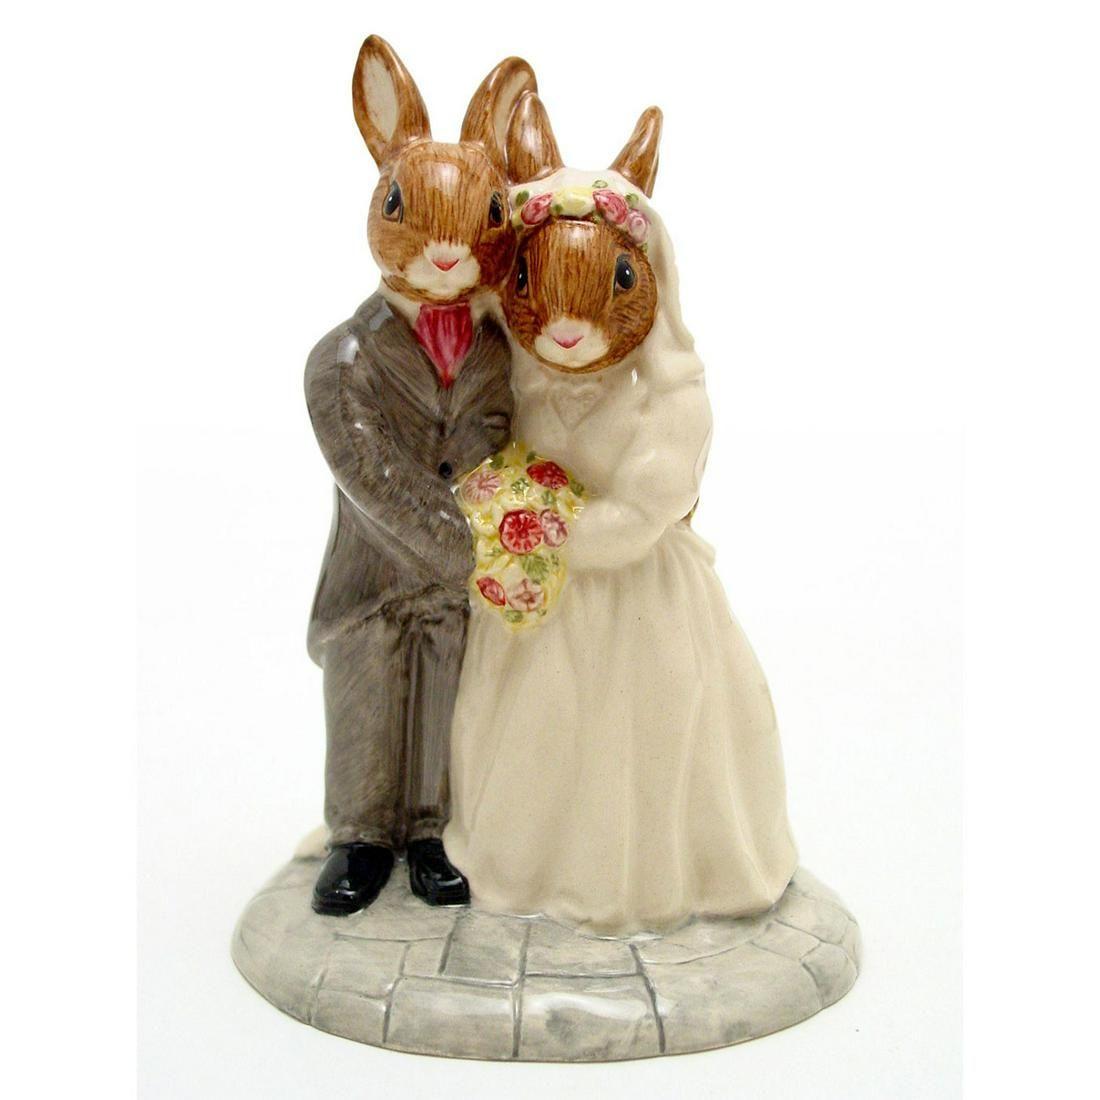 ROYAL DOULTON BUNNYKINS FIGURINE, WEDDING DAY DB287